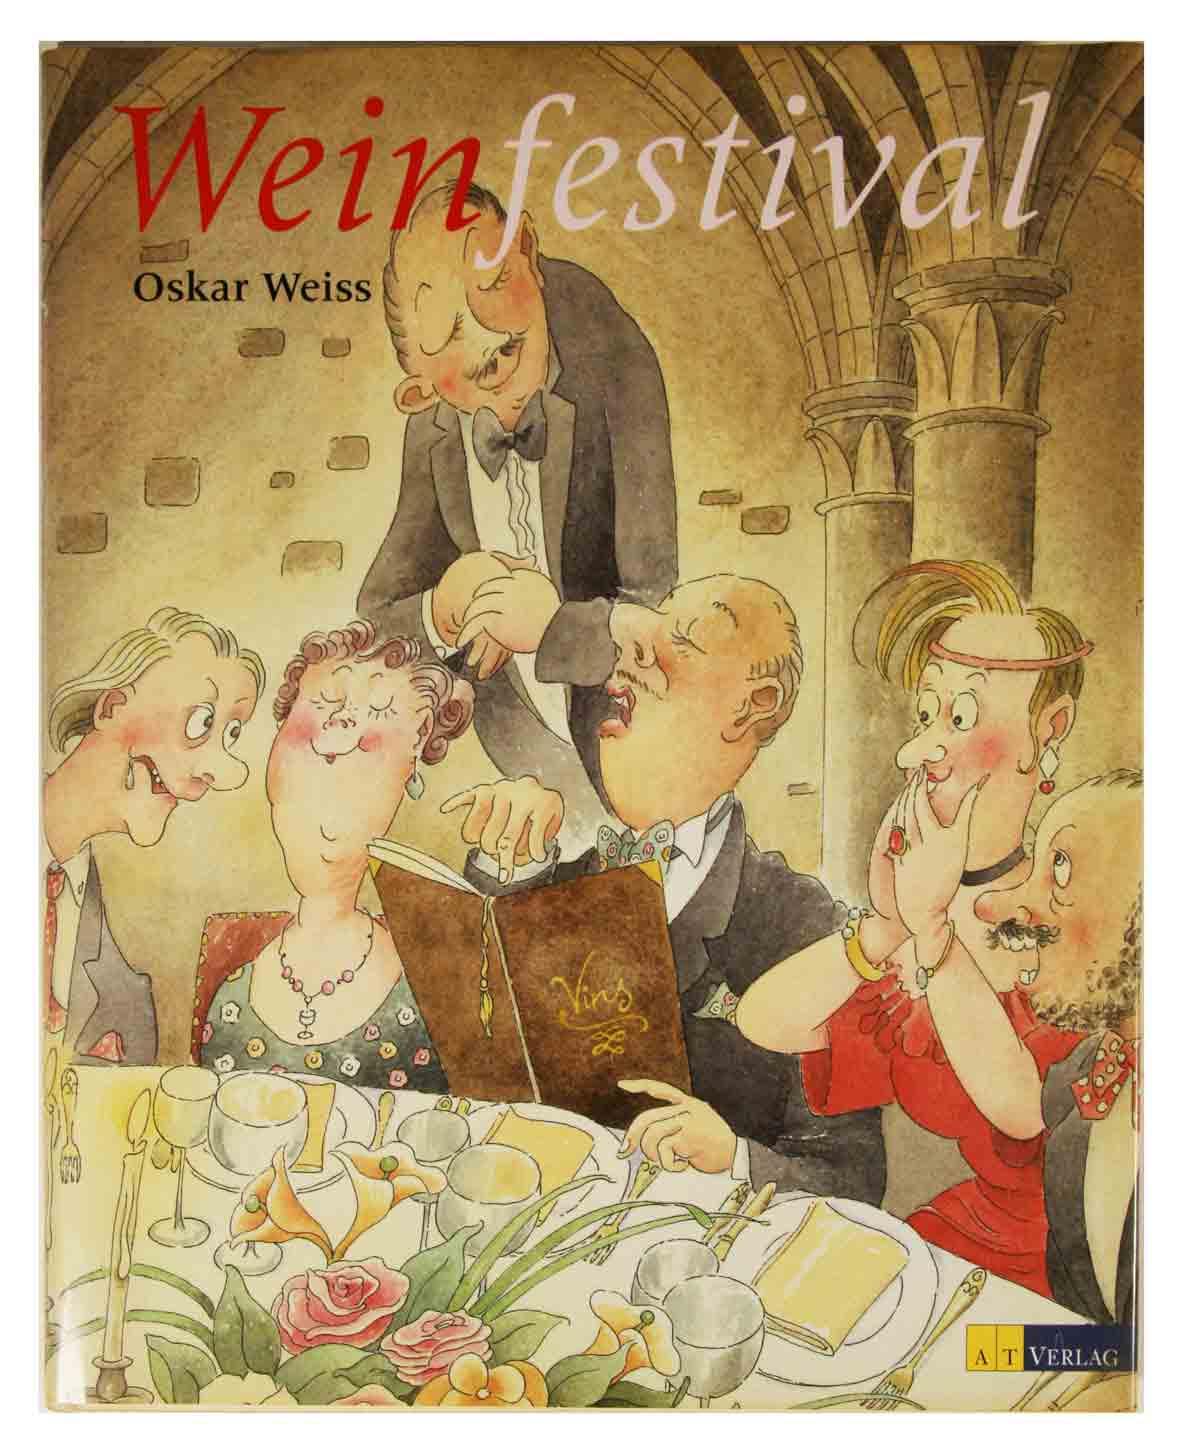 WEISS, OSKAR: - Weinfestival / Bilder, Texte und Zitate von Oskar Weiss.